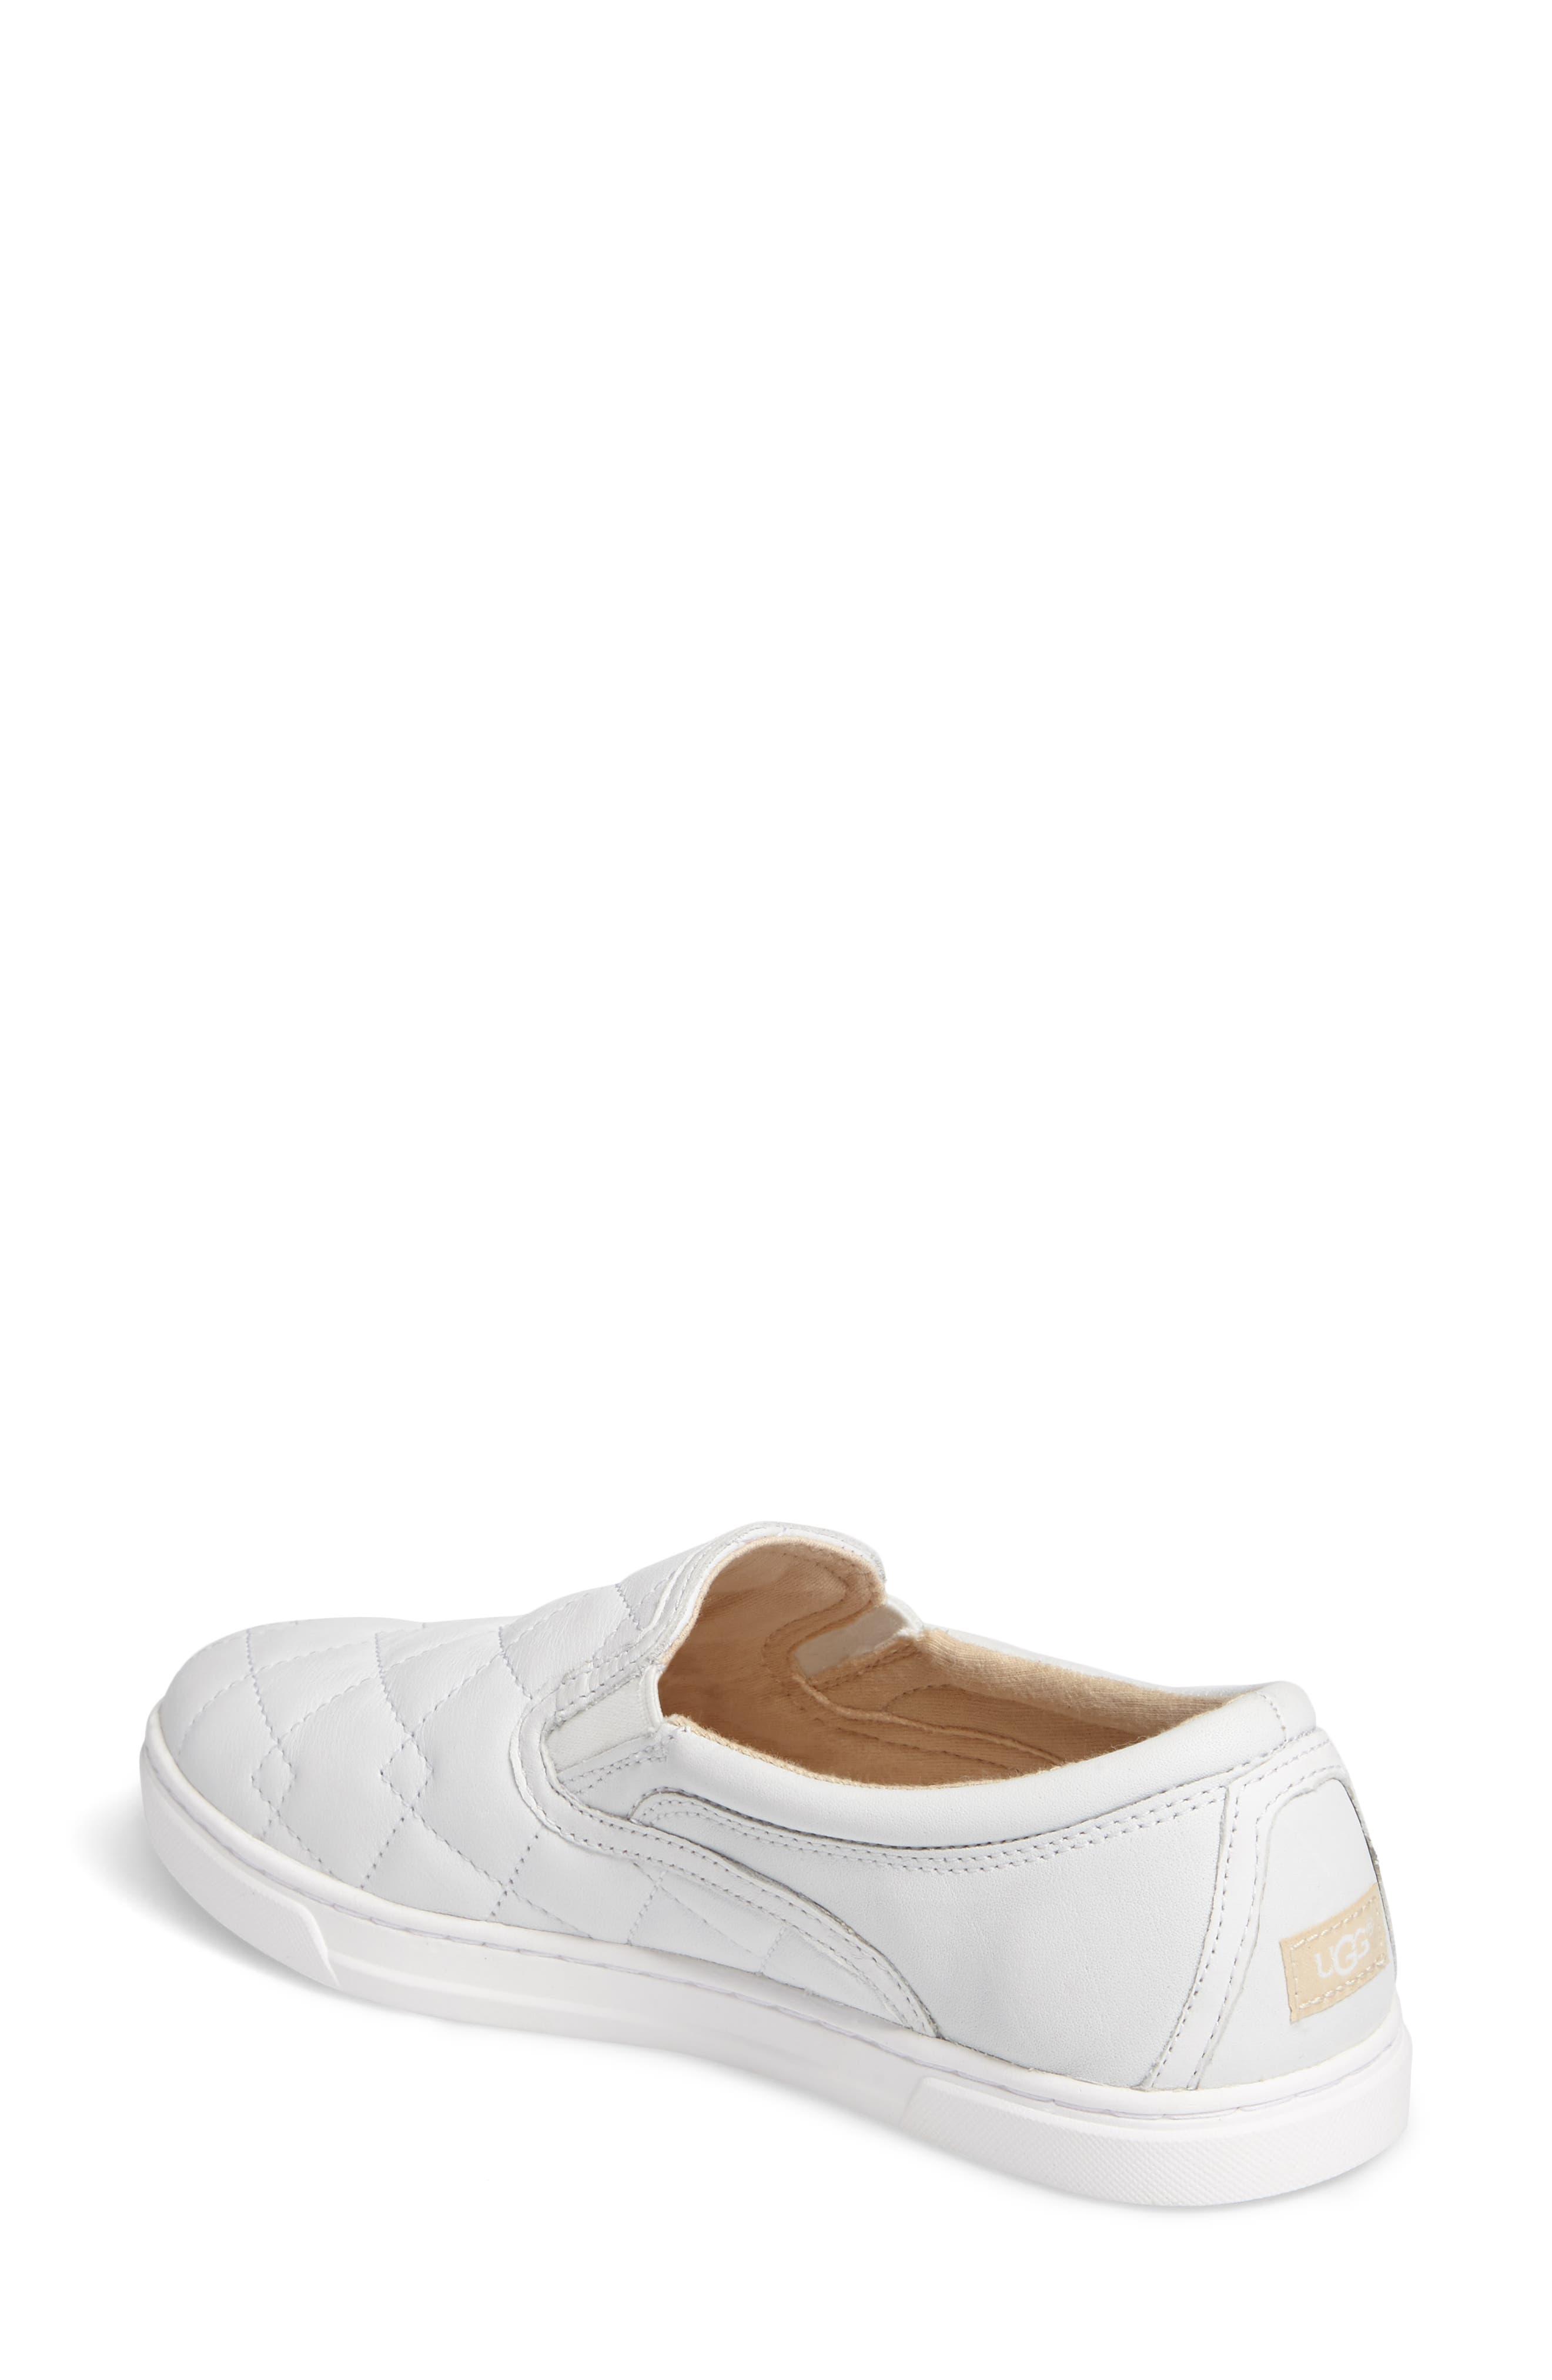 Alternate Image 2  - UGG® Fierce Deco Quilted Slip-On Sneaker (Women)